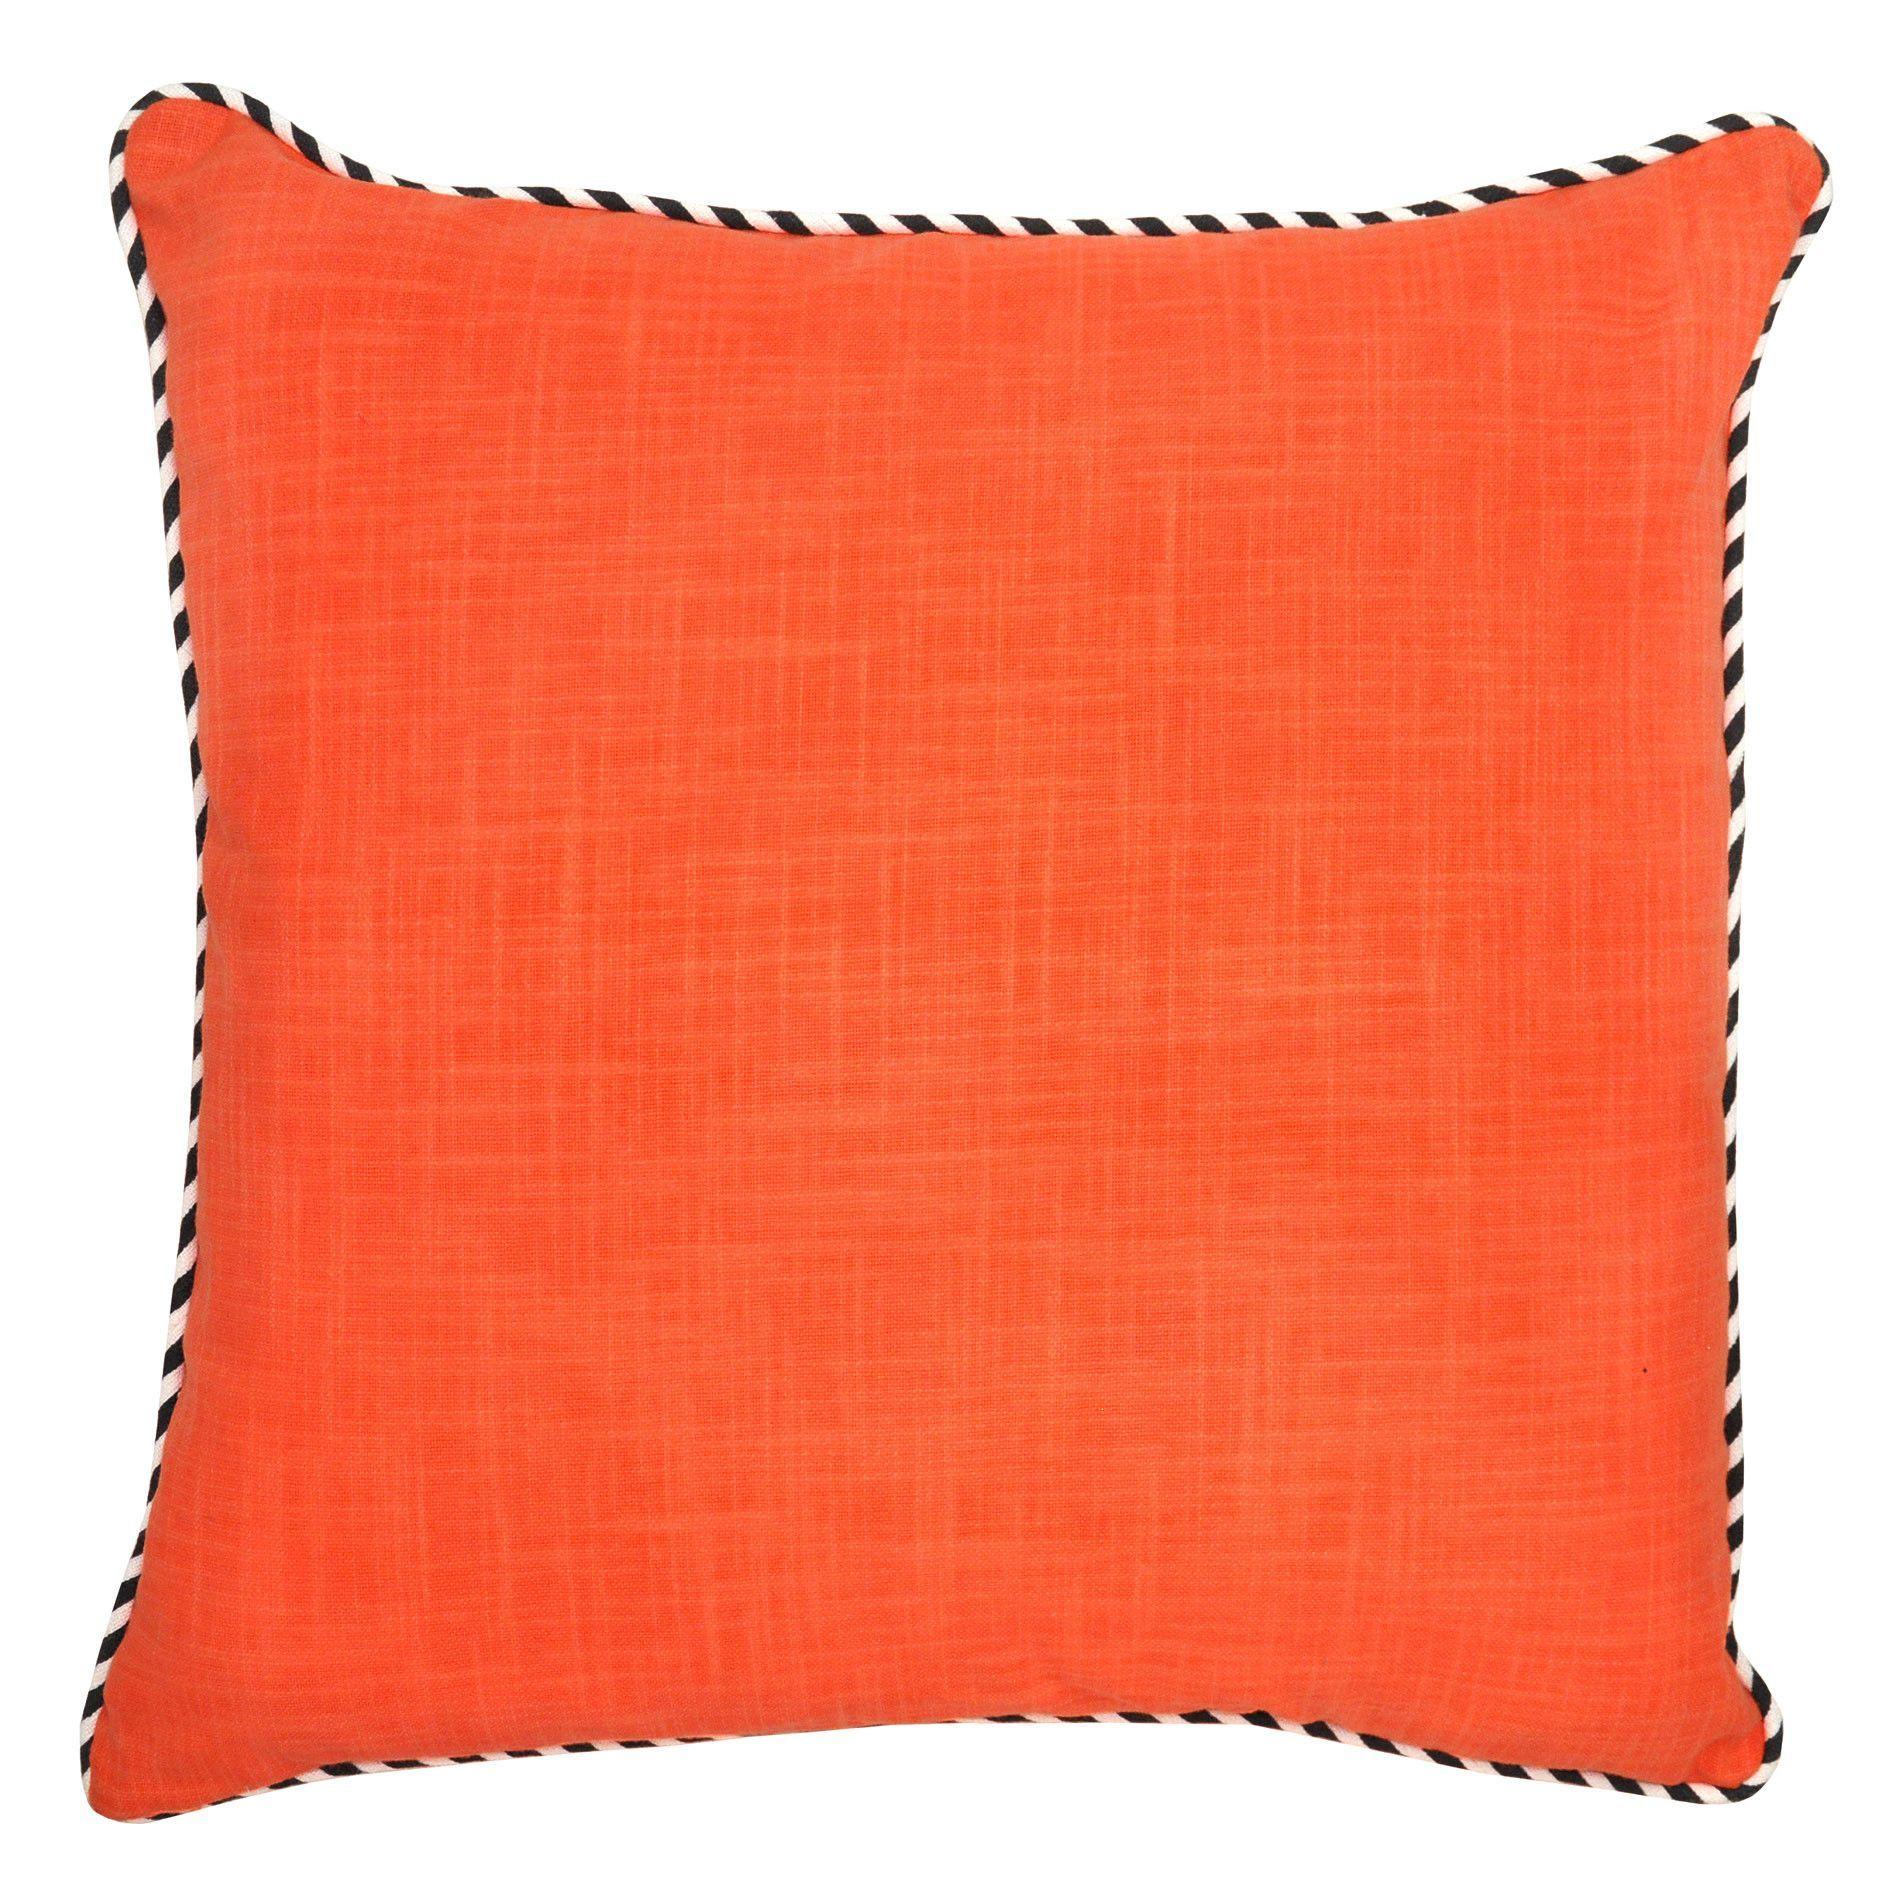 Moda cotton throw pillow products pinterest cotton throws and